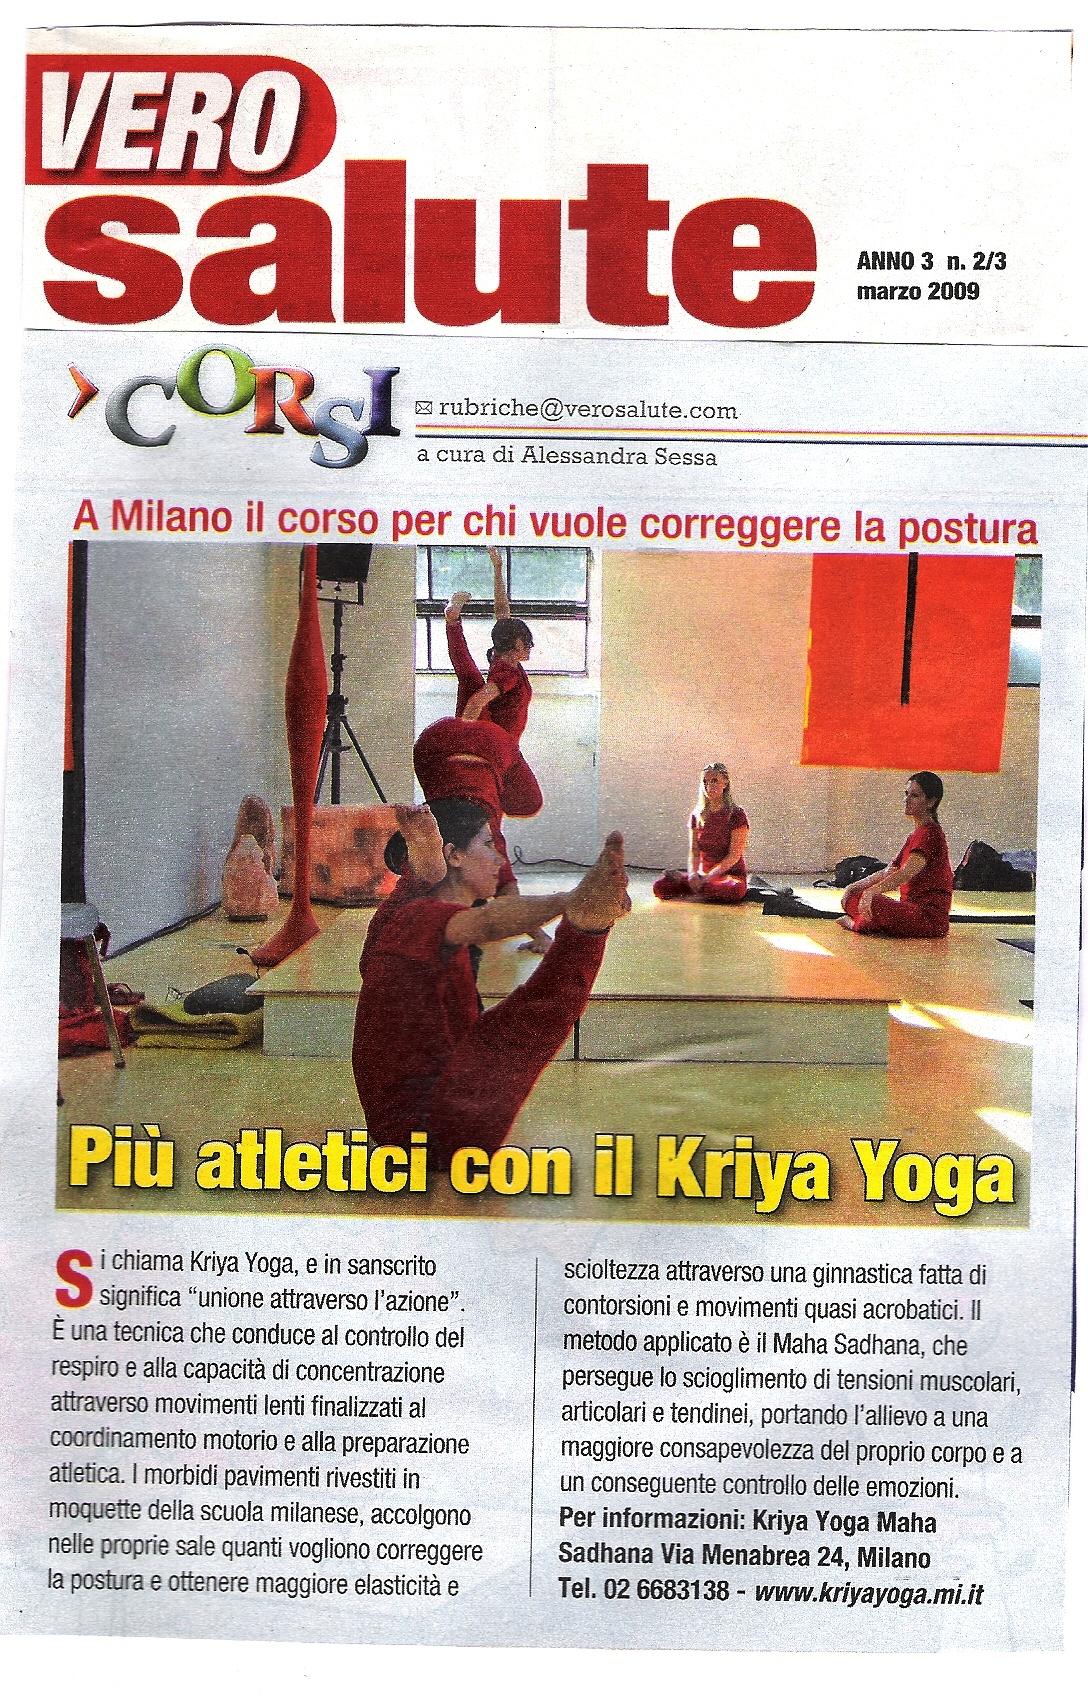 Più atletici con kriya yoga